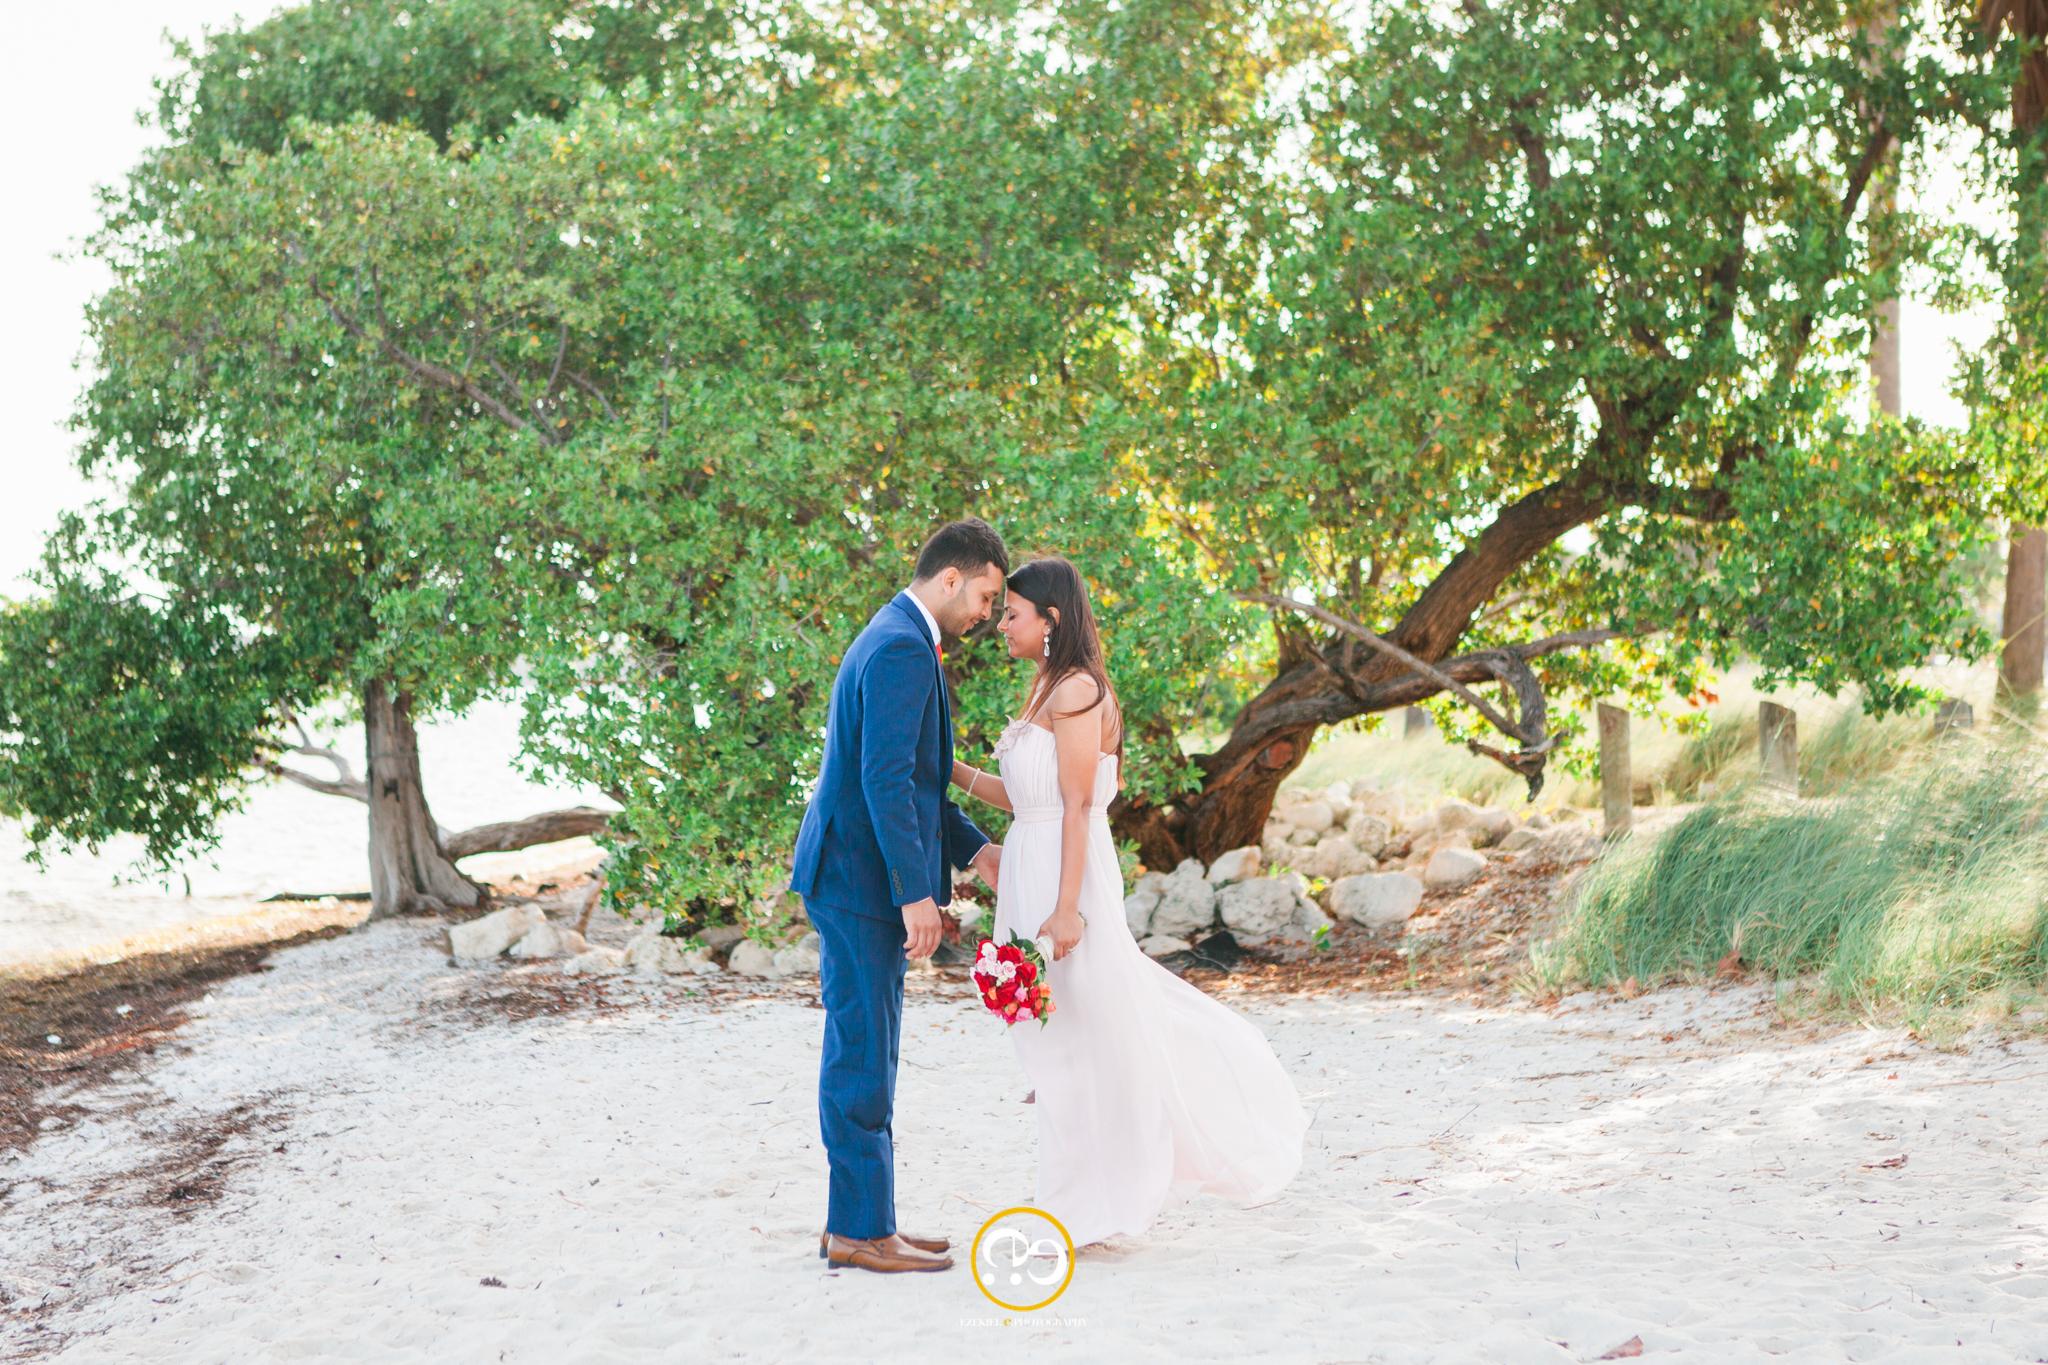 Key Biscayne beach wedding photography